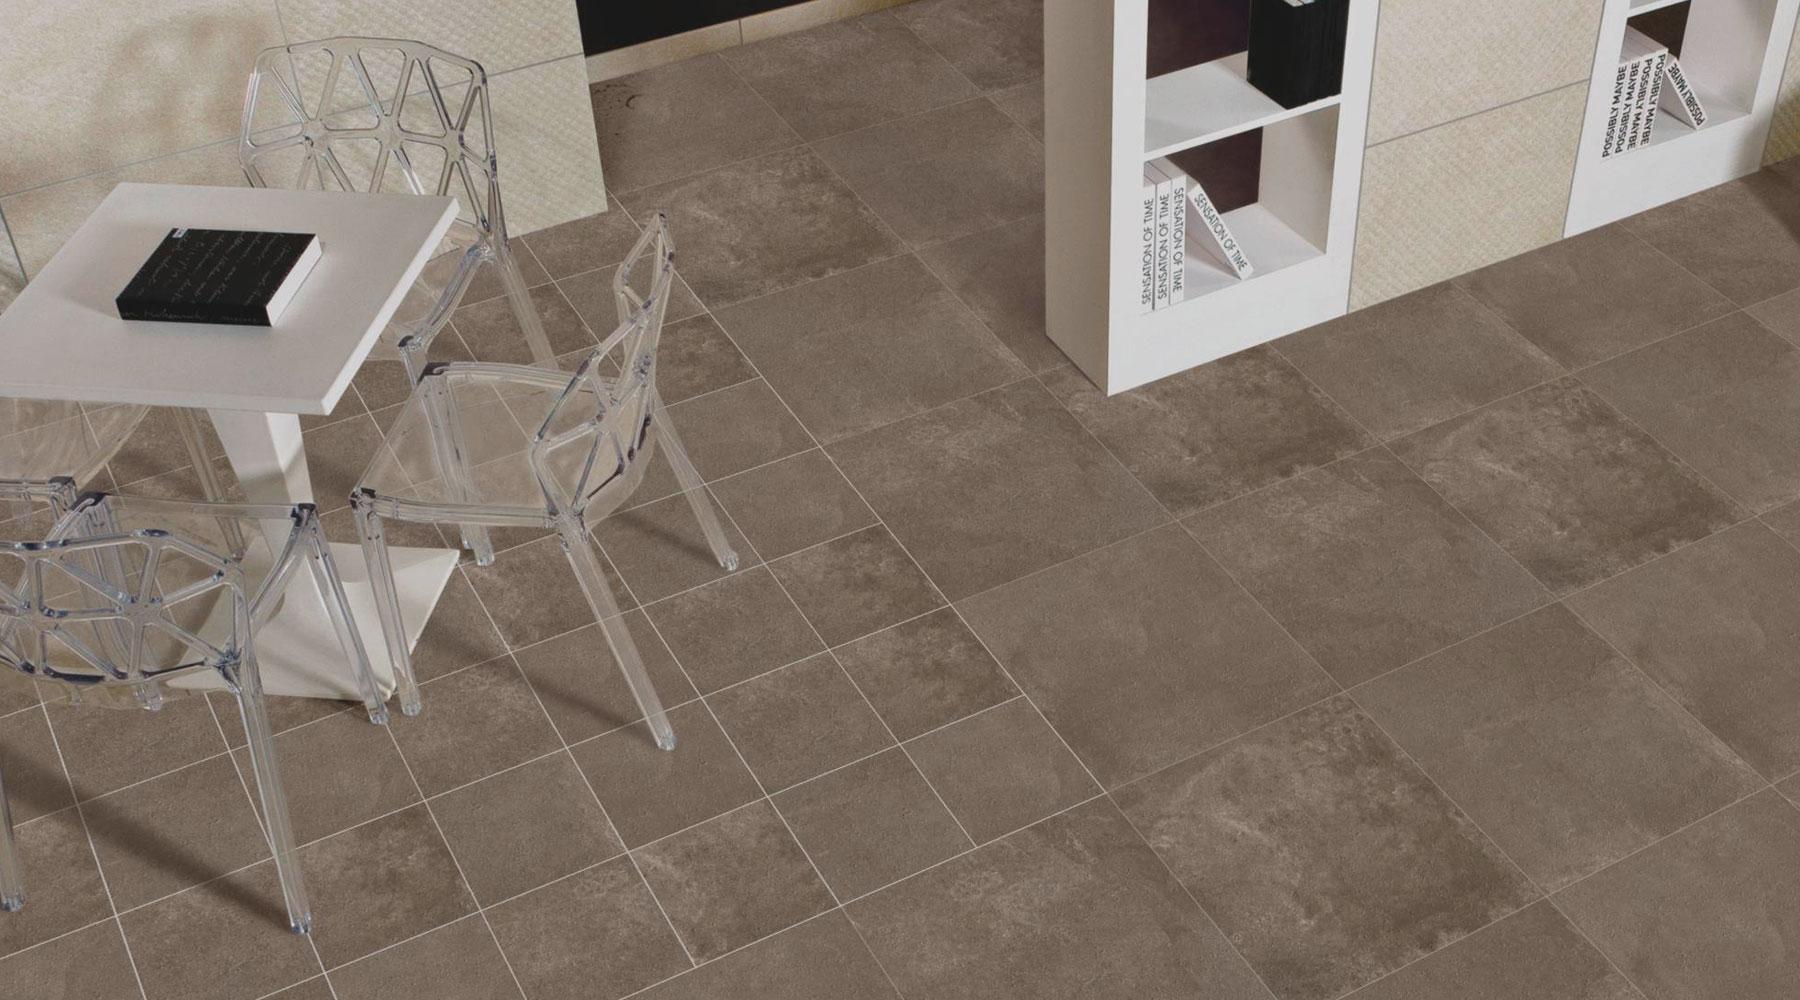 Ethics vitrified floor tiles by logan ceramic morbi india doublecrazyfo Gallery